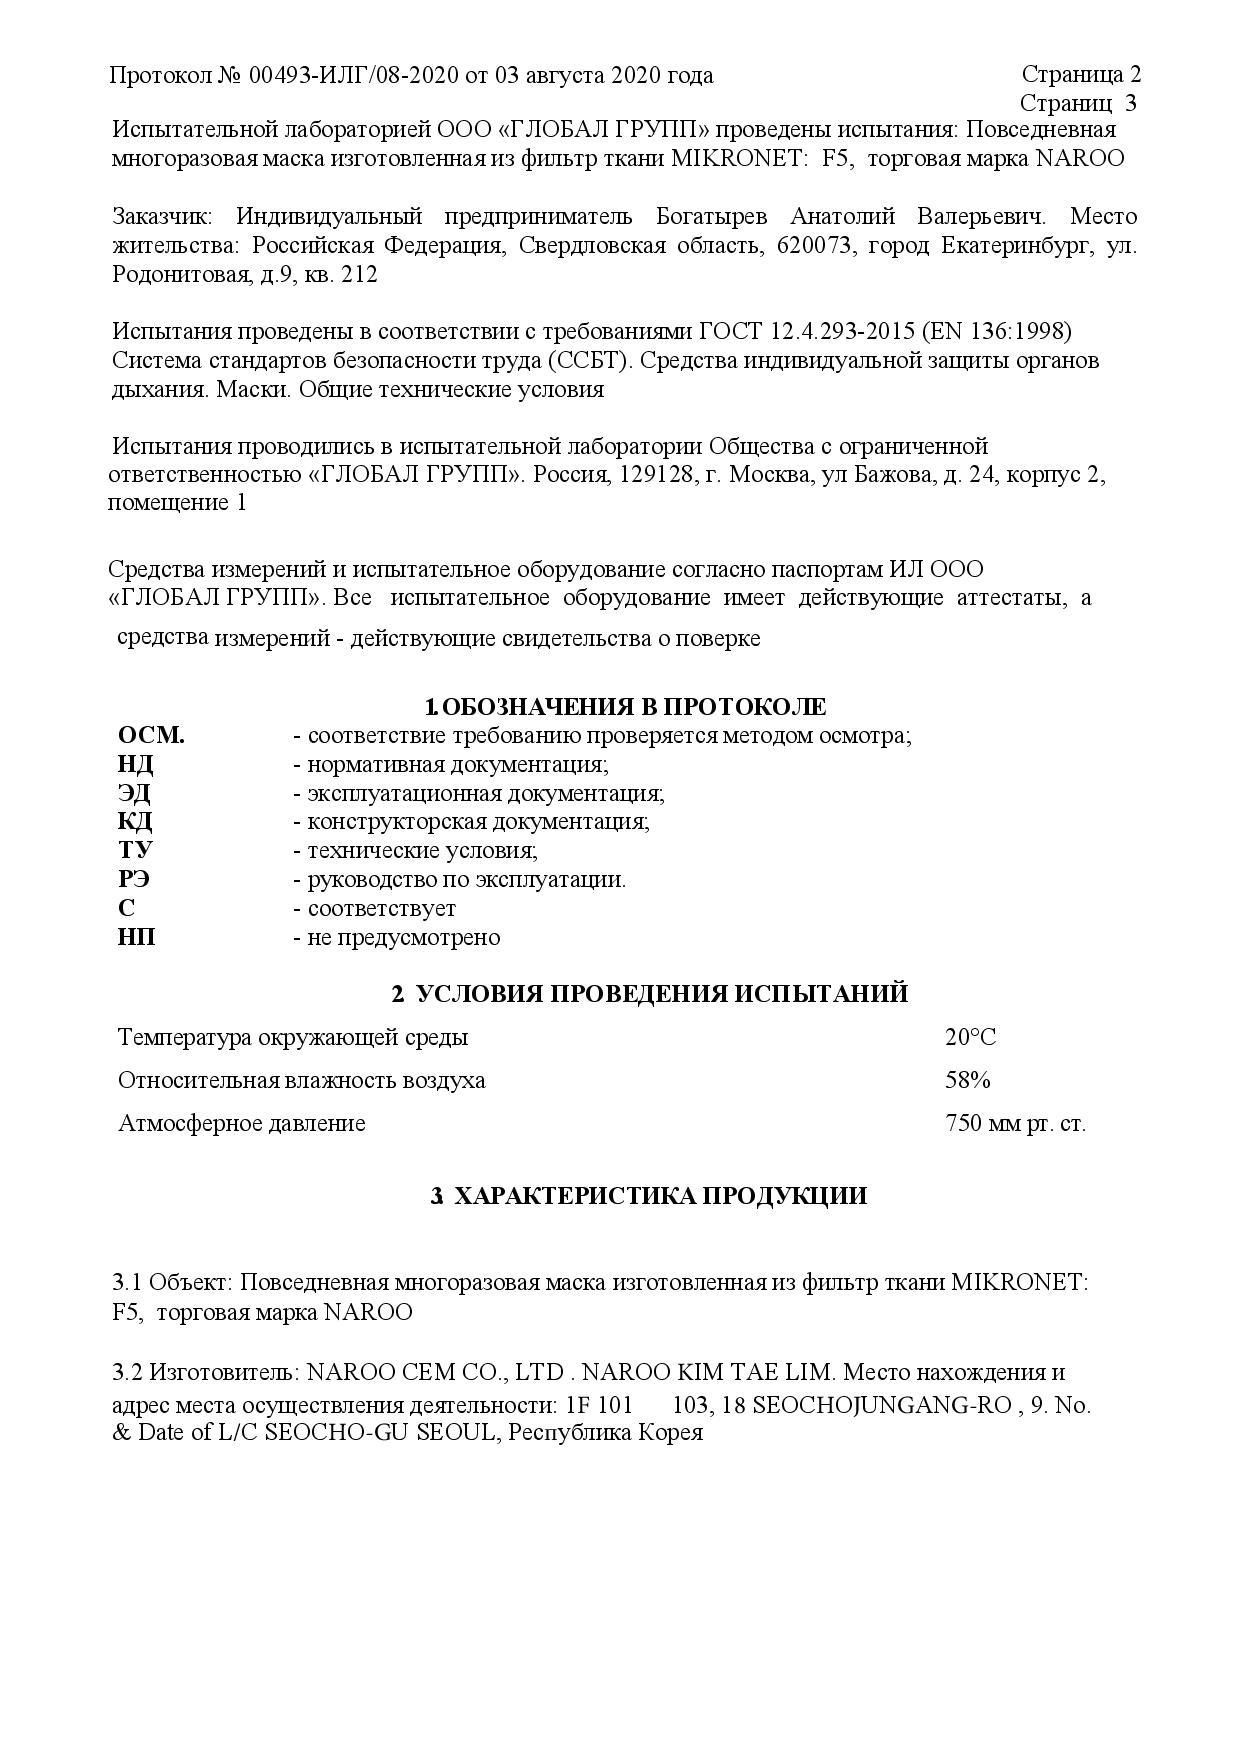 Test Protocol RU (2)